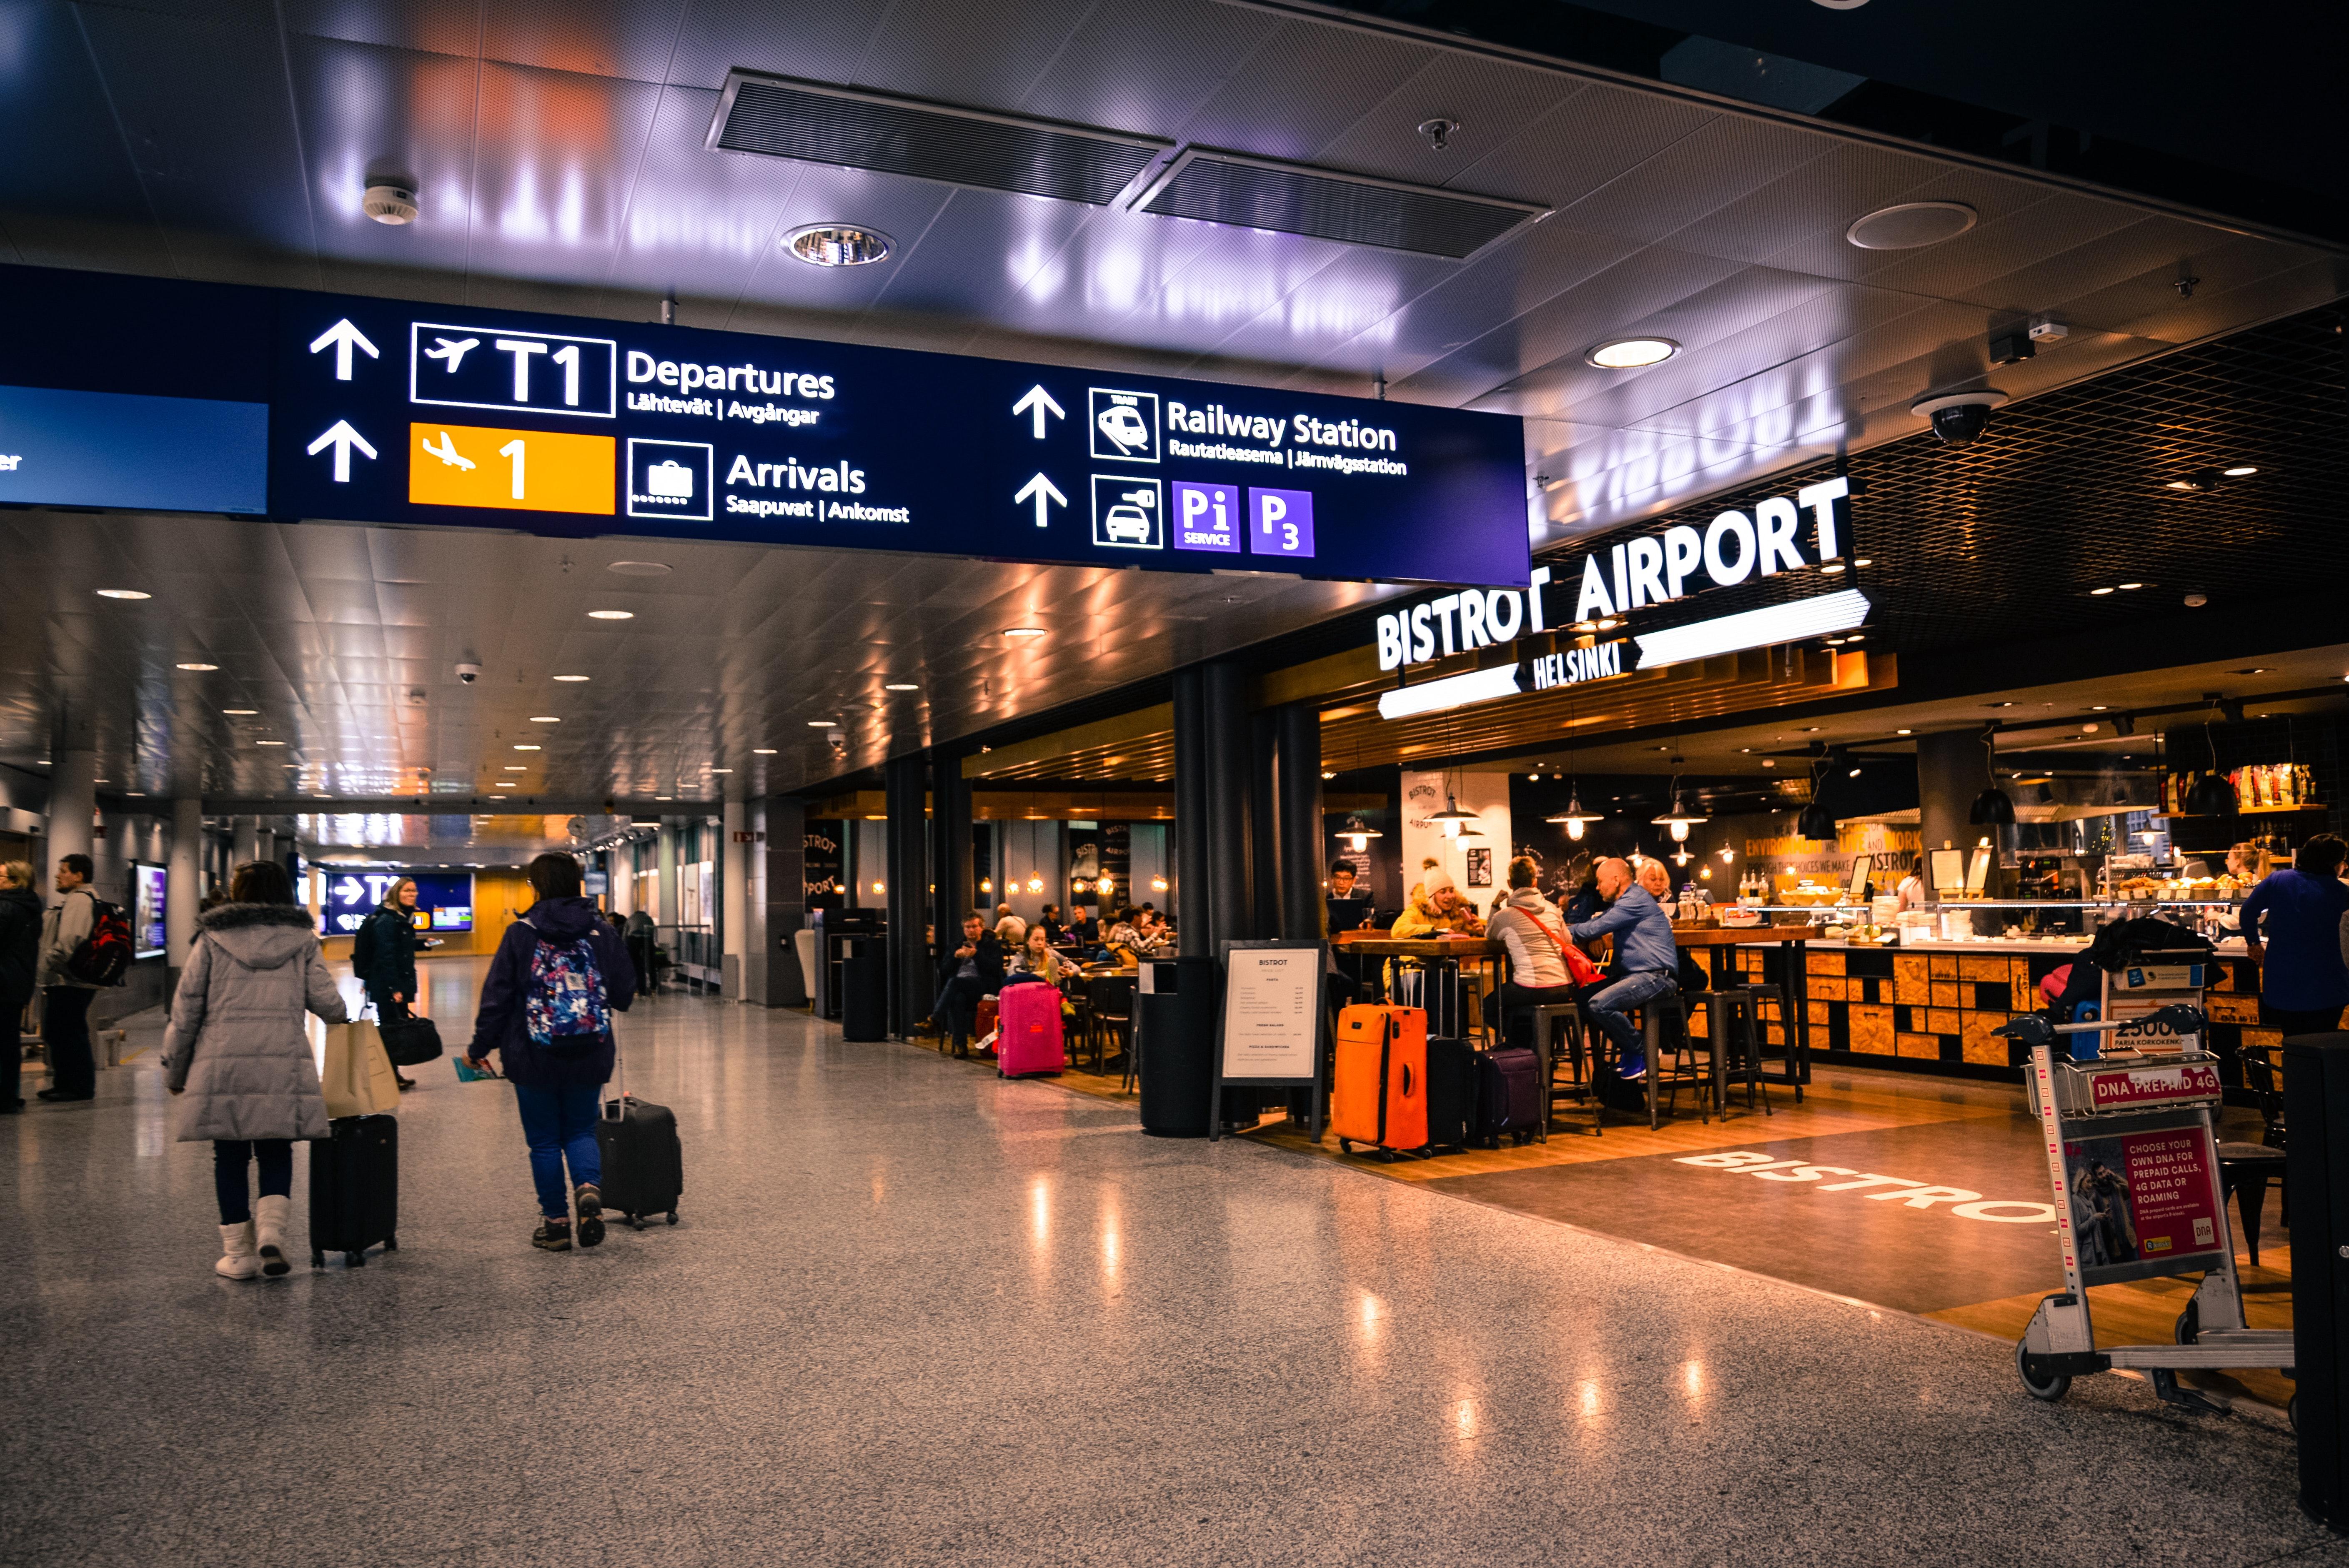 Transportation Hub: Airport